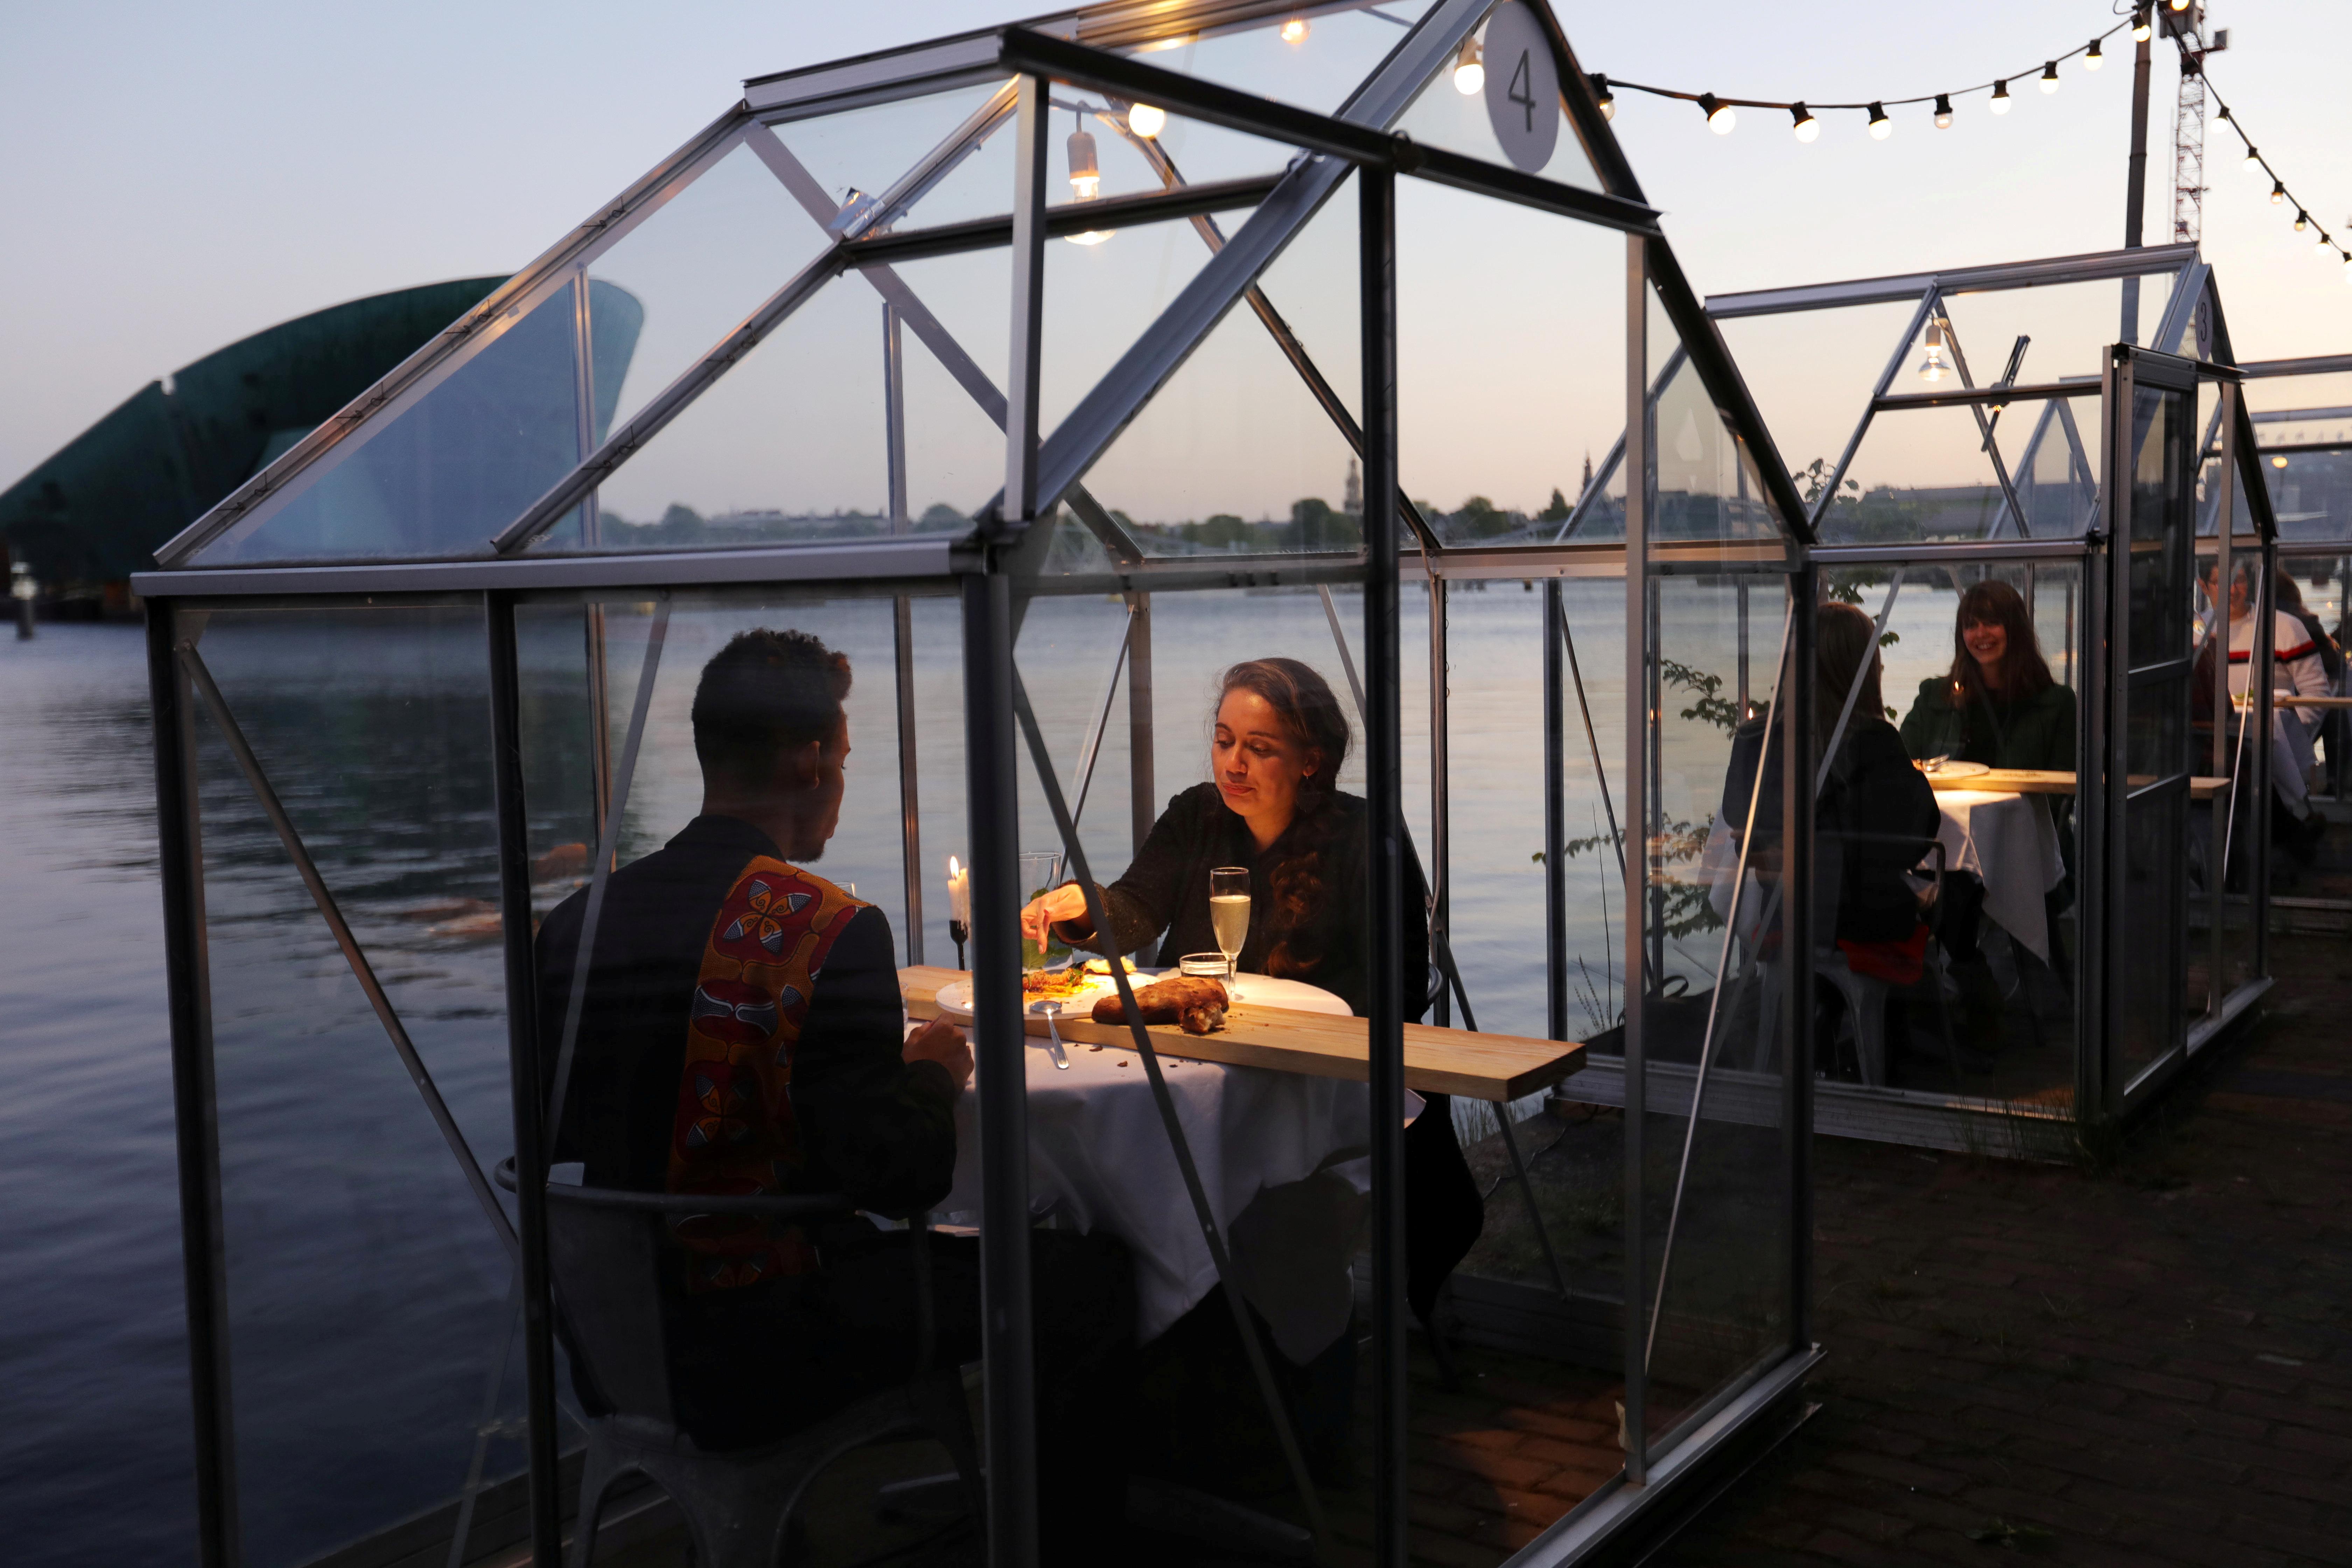 Chacun sa serre dans un restaurant d'Amsterdam